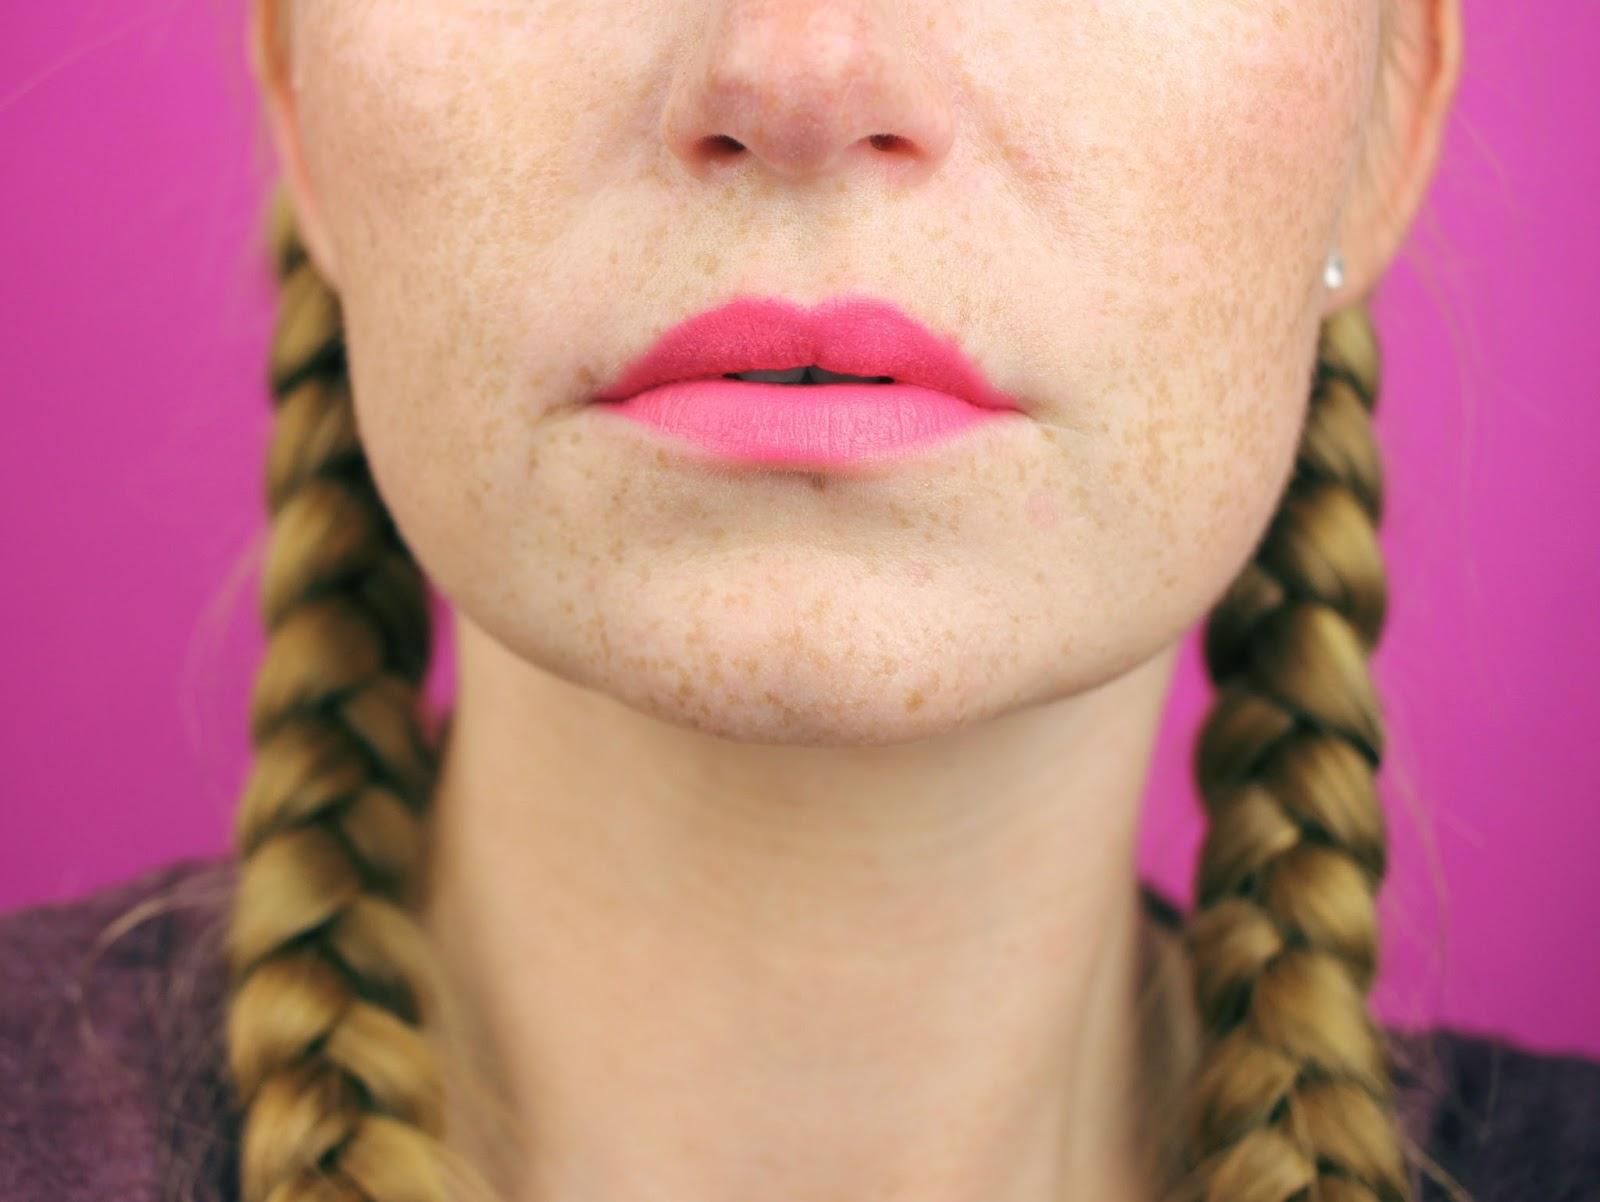 blush, concealer palette, drogerie, essence, laugh, life is a festival, lippenstifte, live, look, love, mattes finish, nagellack, pink, review, rosenholz, swatches, tragebilder, trend edition, tribal, velvet matt,